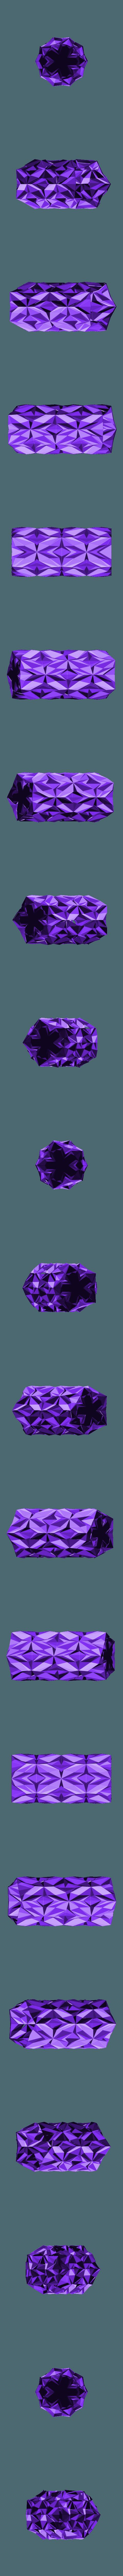 geometric vase.STL Download free STL file Geometric Vase • 3D printable object, tridimagina